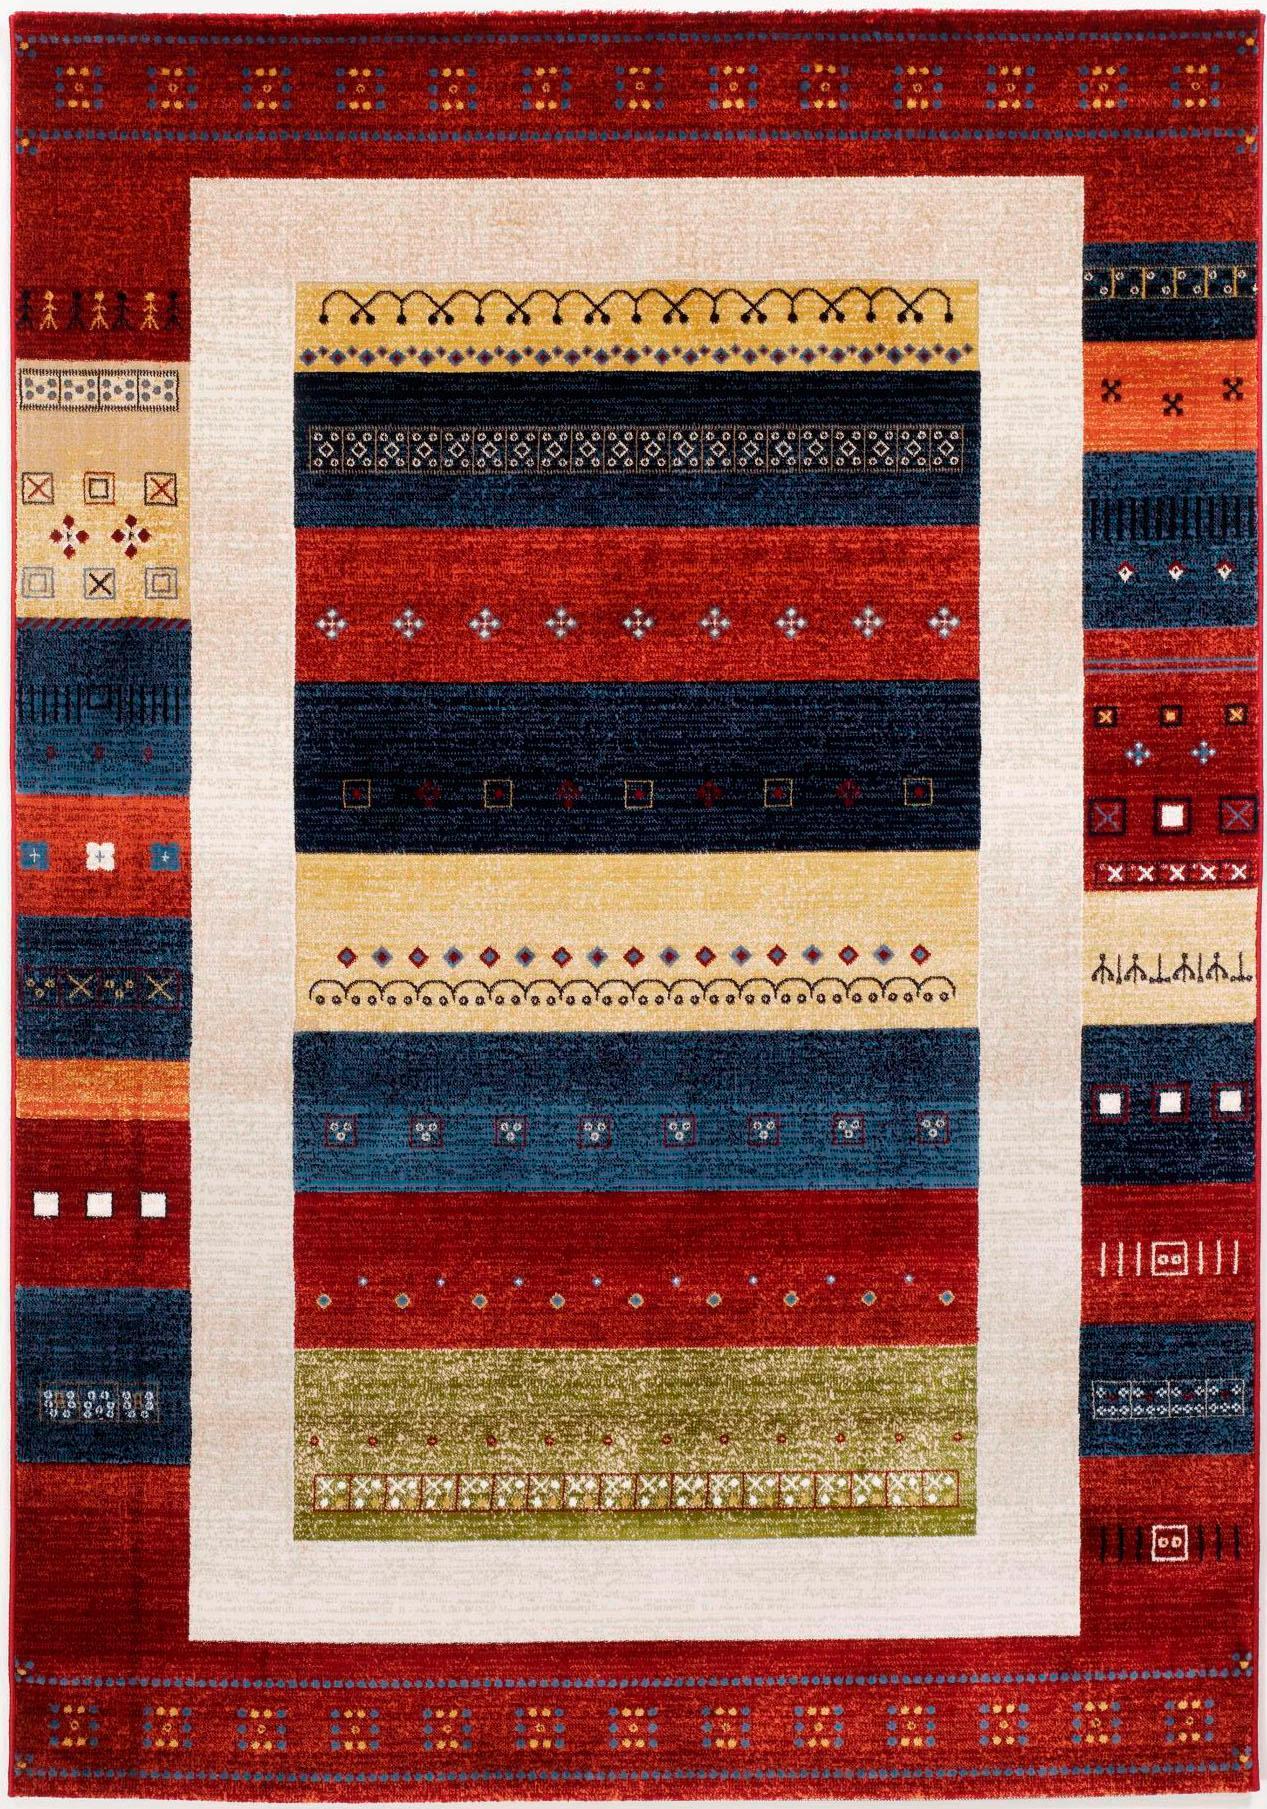 Teppich, »Megaglance Kaska«, OCI DIE TEPPICHMARKE, rechteckig, Höhe 8 mm, maschinell gewebt | Heimtextilien > Teppiche > Sonstige-Teppiche | OCI